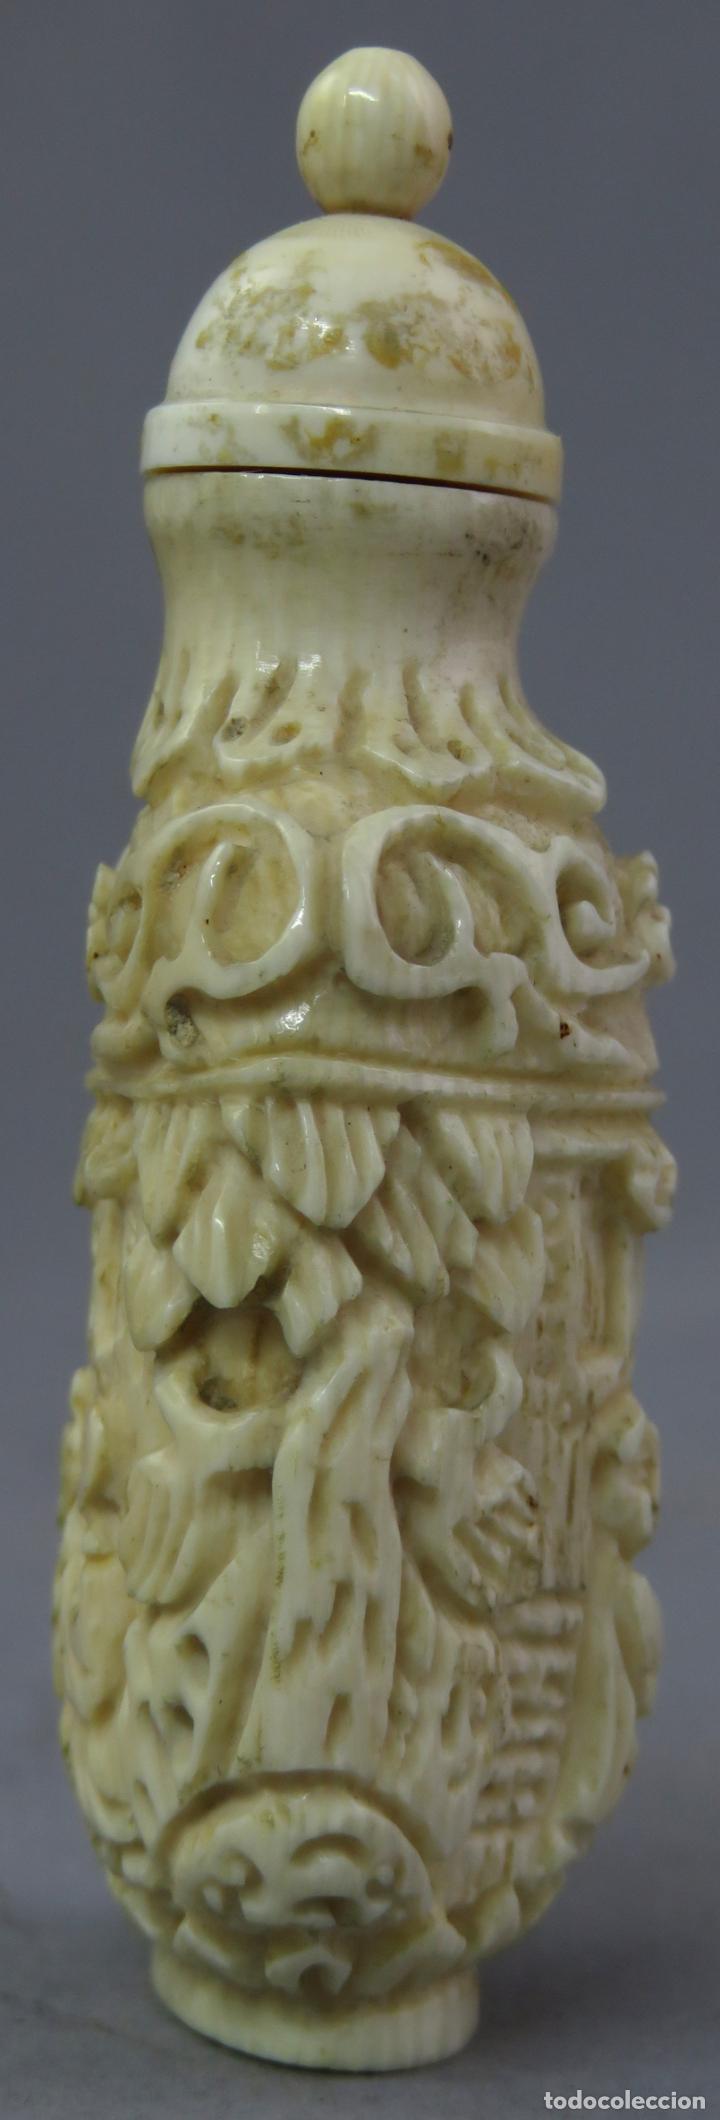 Arte: Perfumero chino tallado snuff bottle China siglo XIX - Foto 3 - 225310220